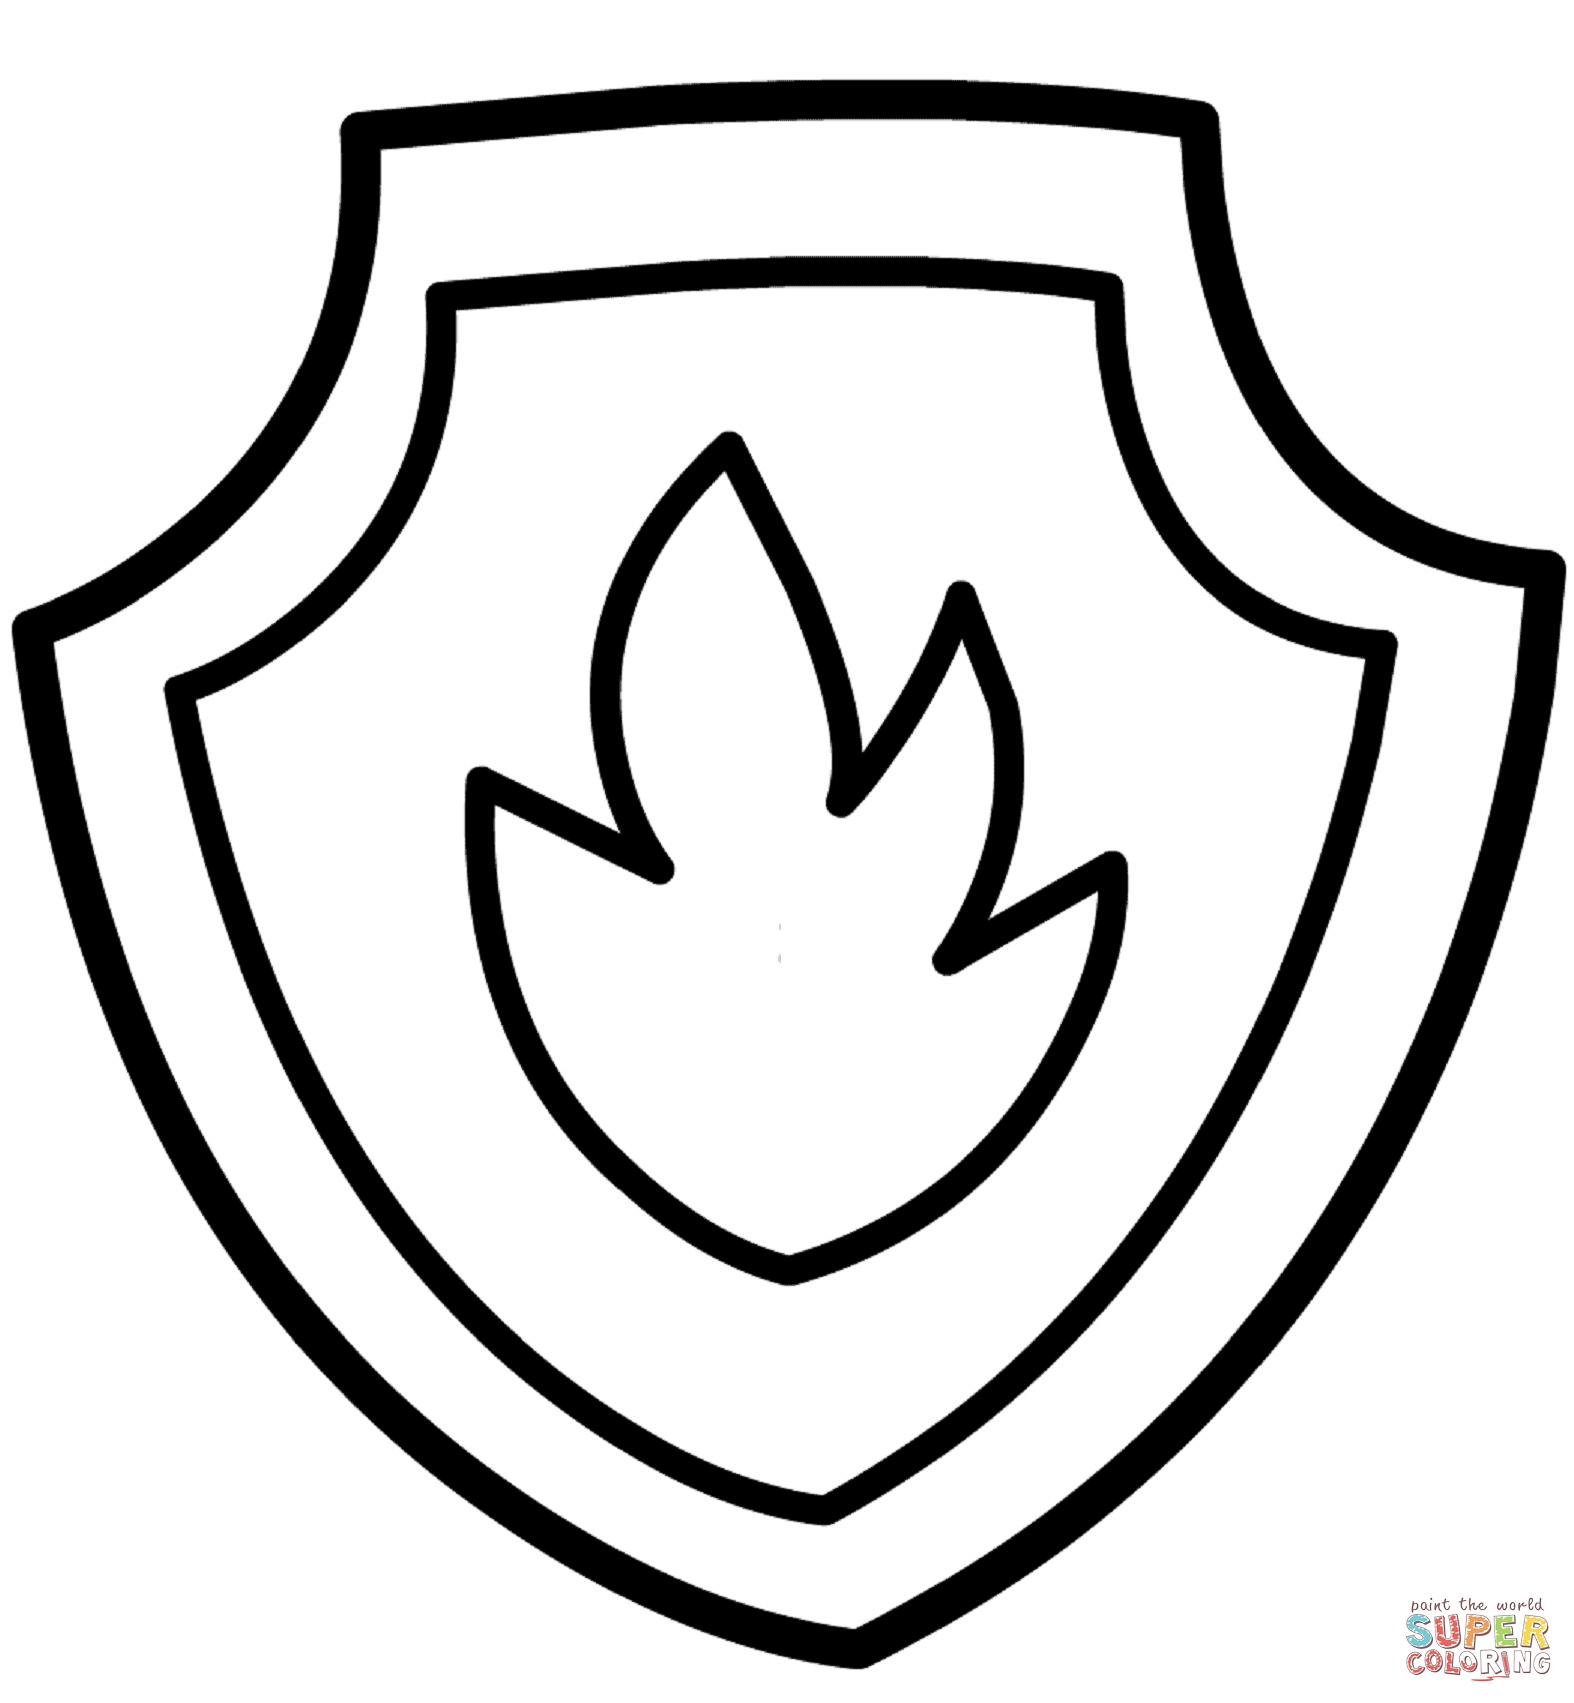 1574x1703 Paw Patrol Badge Black And White Ltbgtpaw Patrolltgt Marshall's Ltb